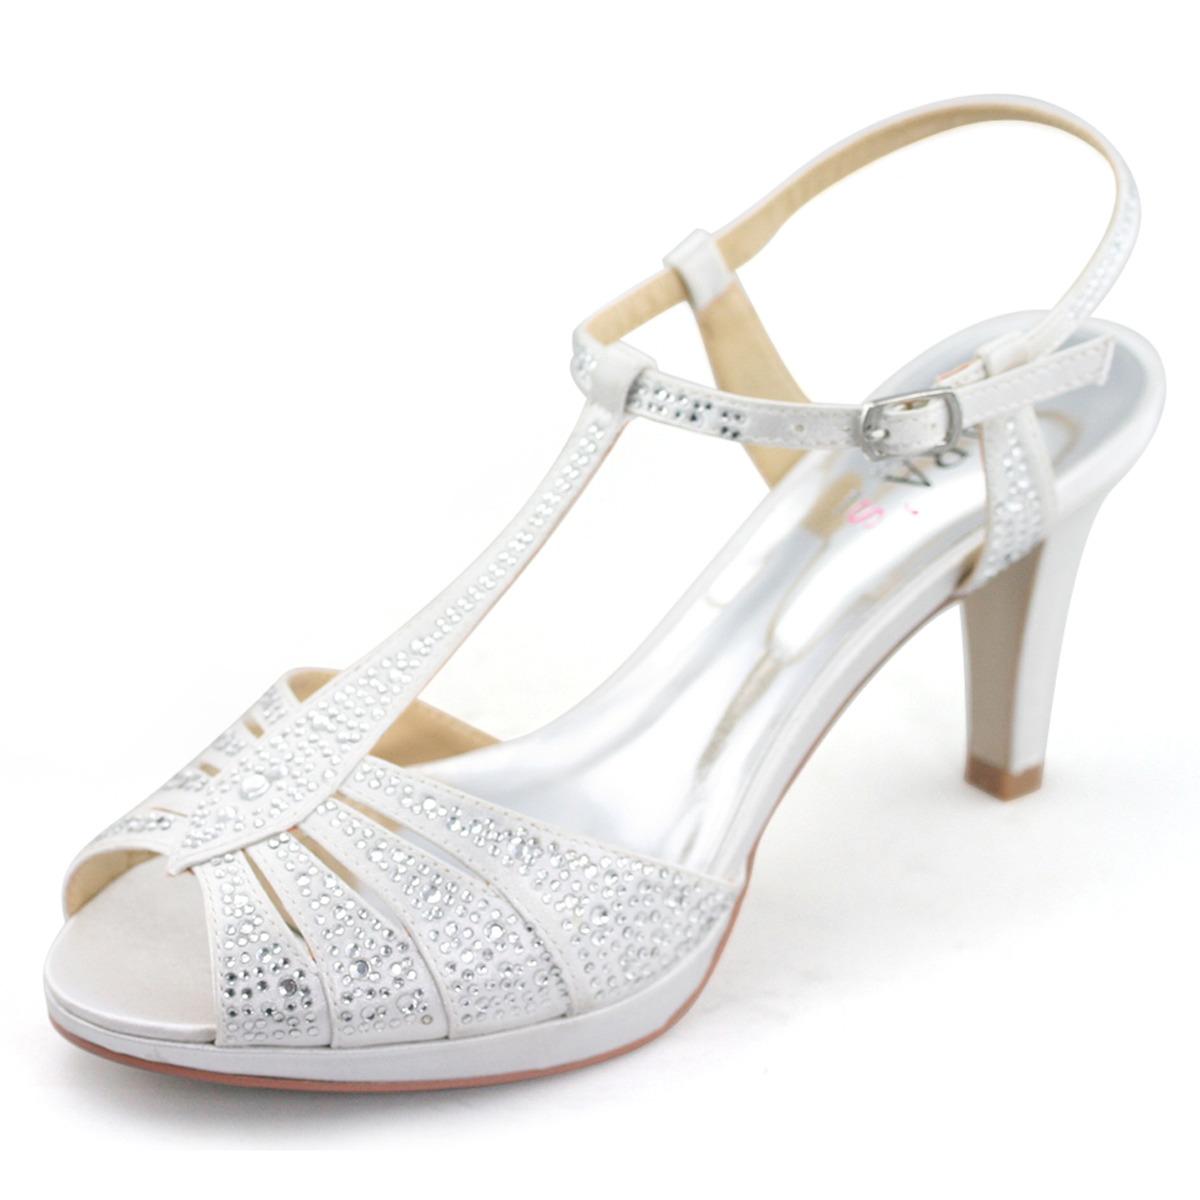 womens silver high heels rhinestones T bar shoes match ...